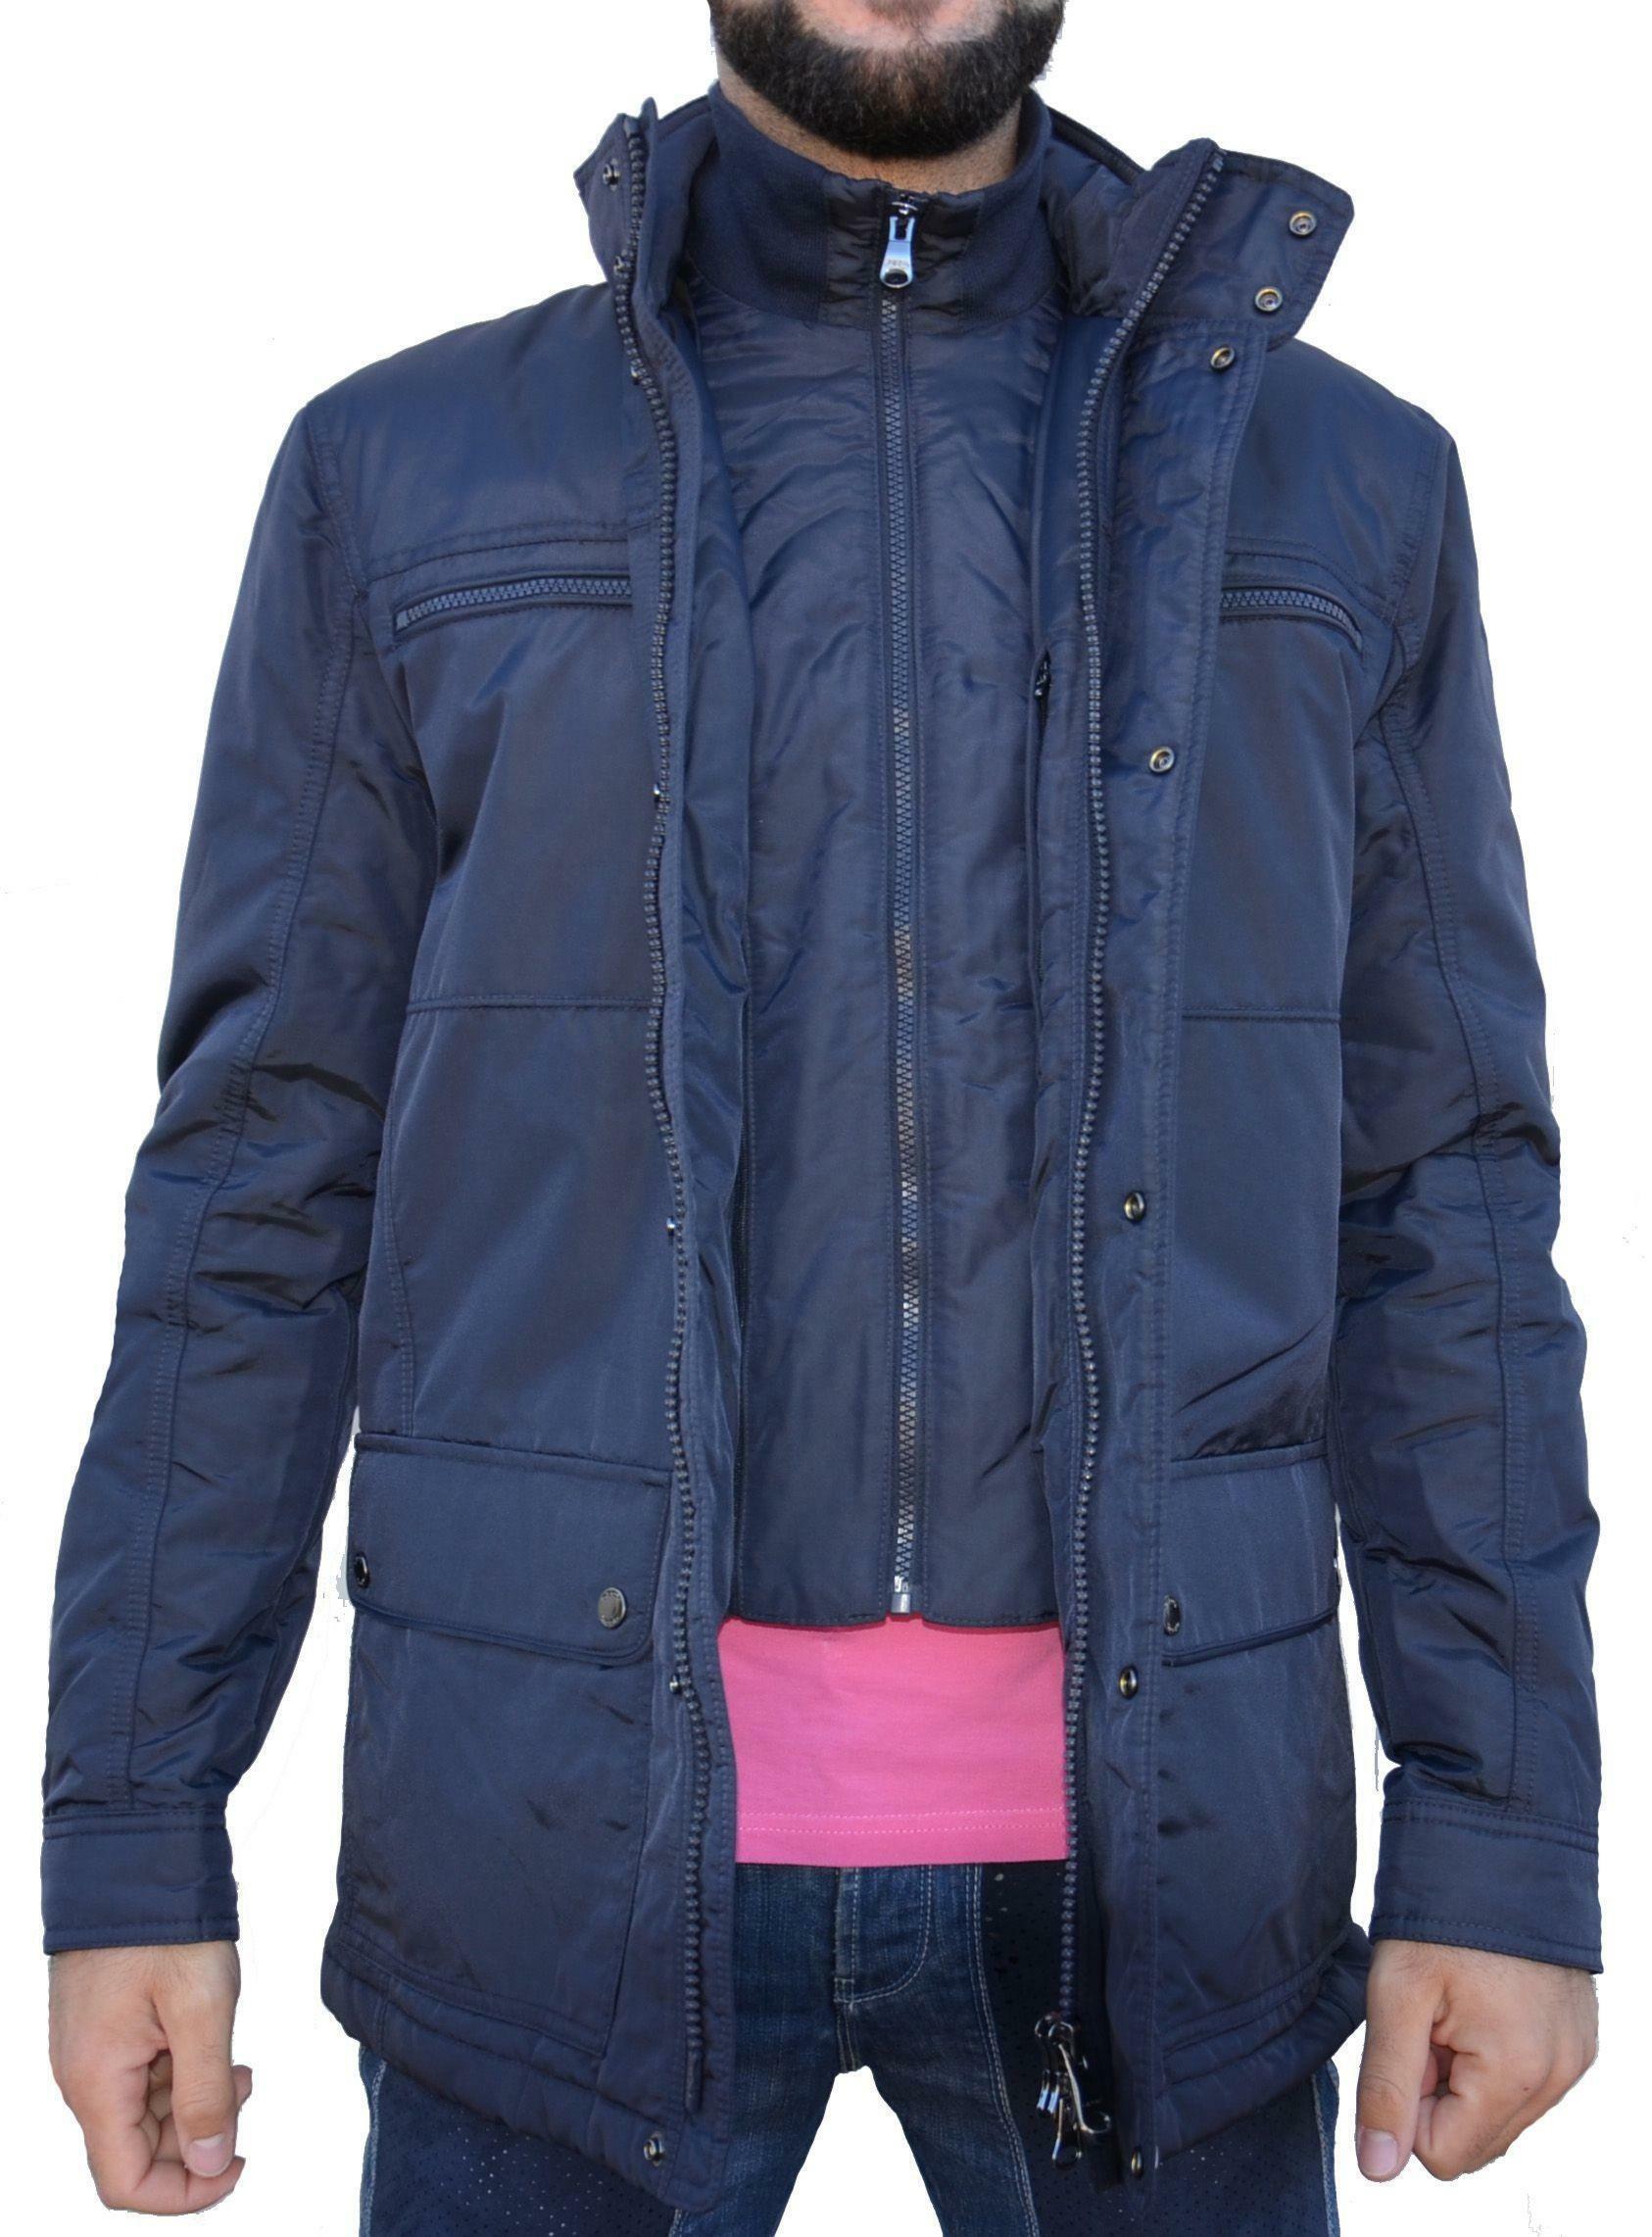 geox man jacket navy giubbotto uomo blu scuro